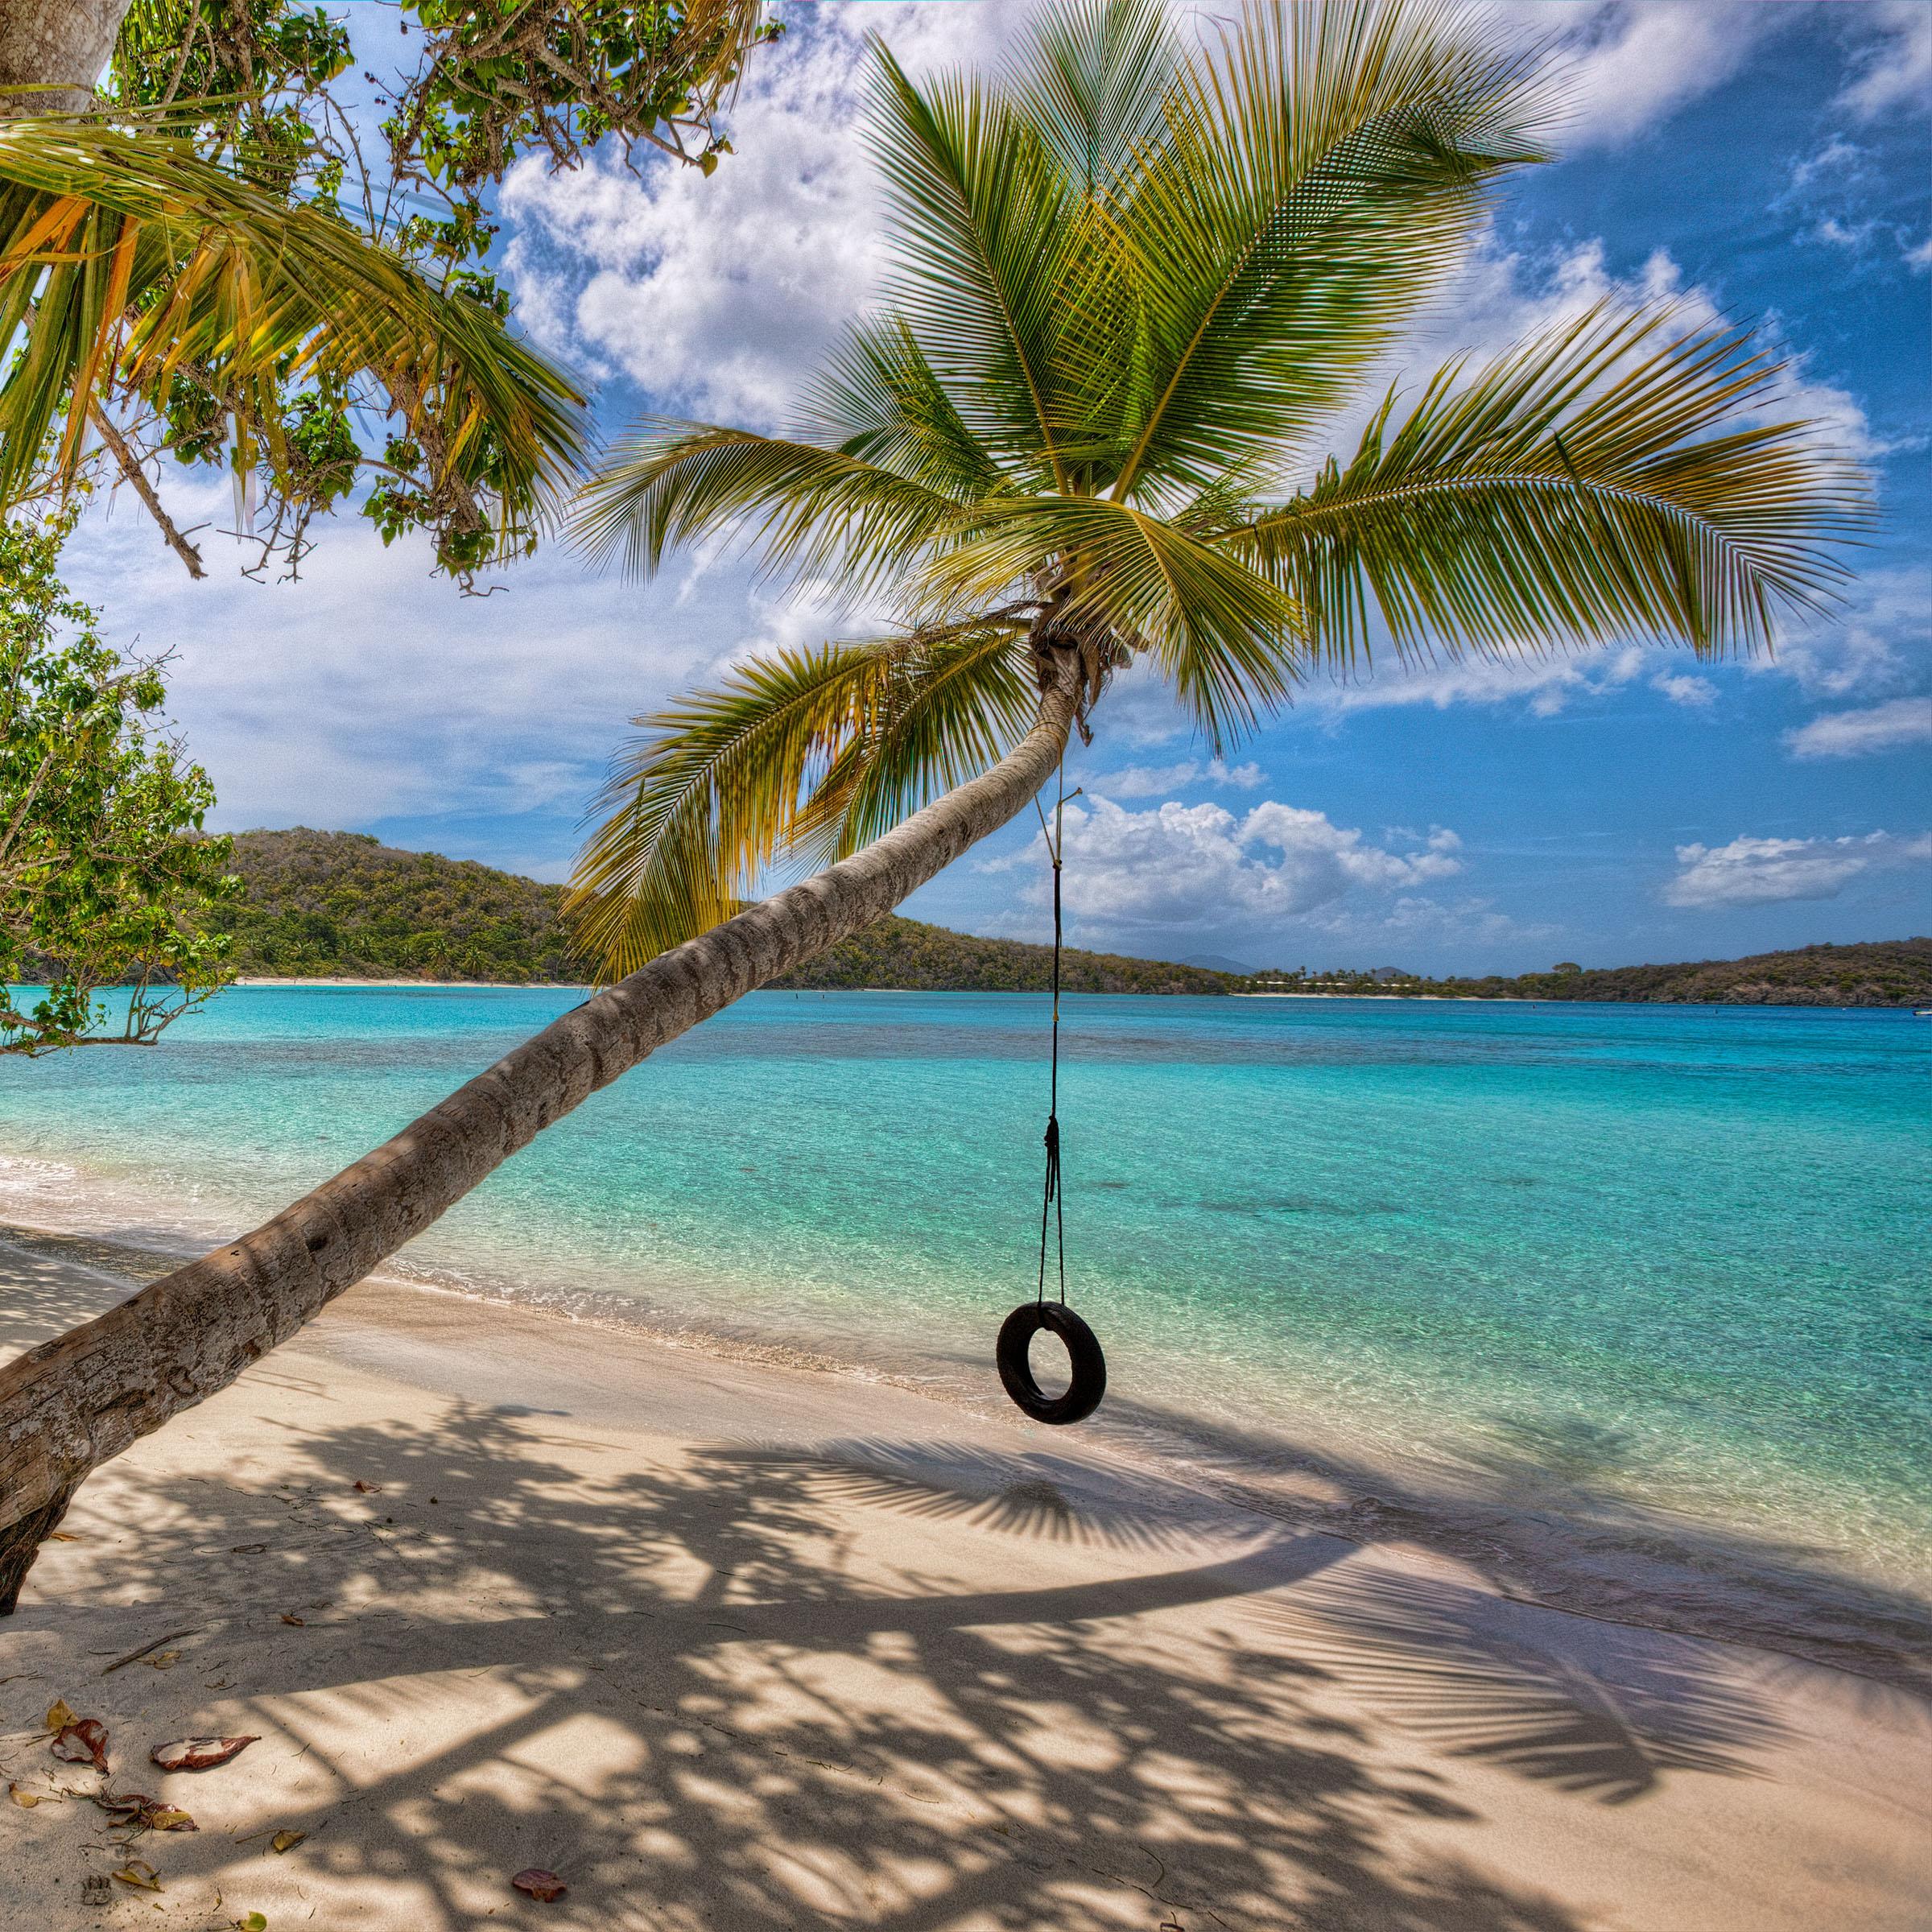 Caribbean Islands: The Beauty Of The Caribbean Islands. Photographs Of